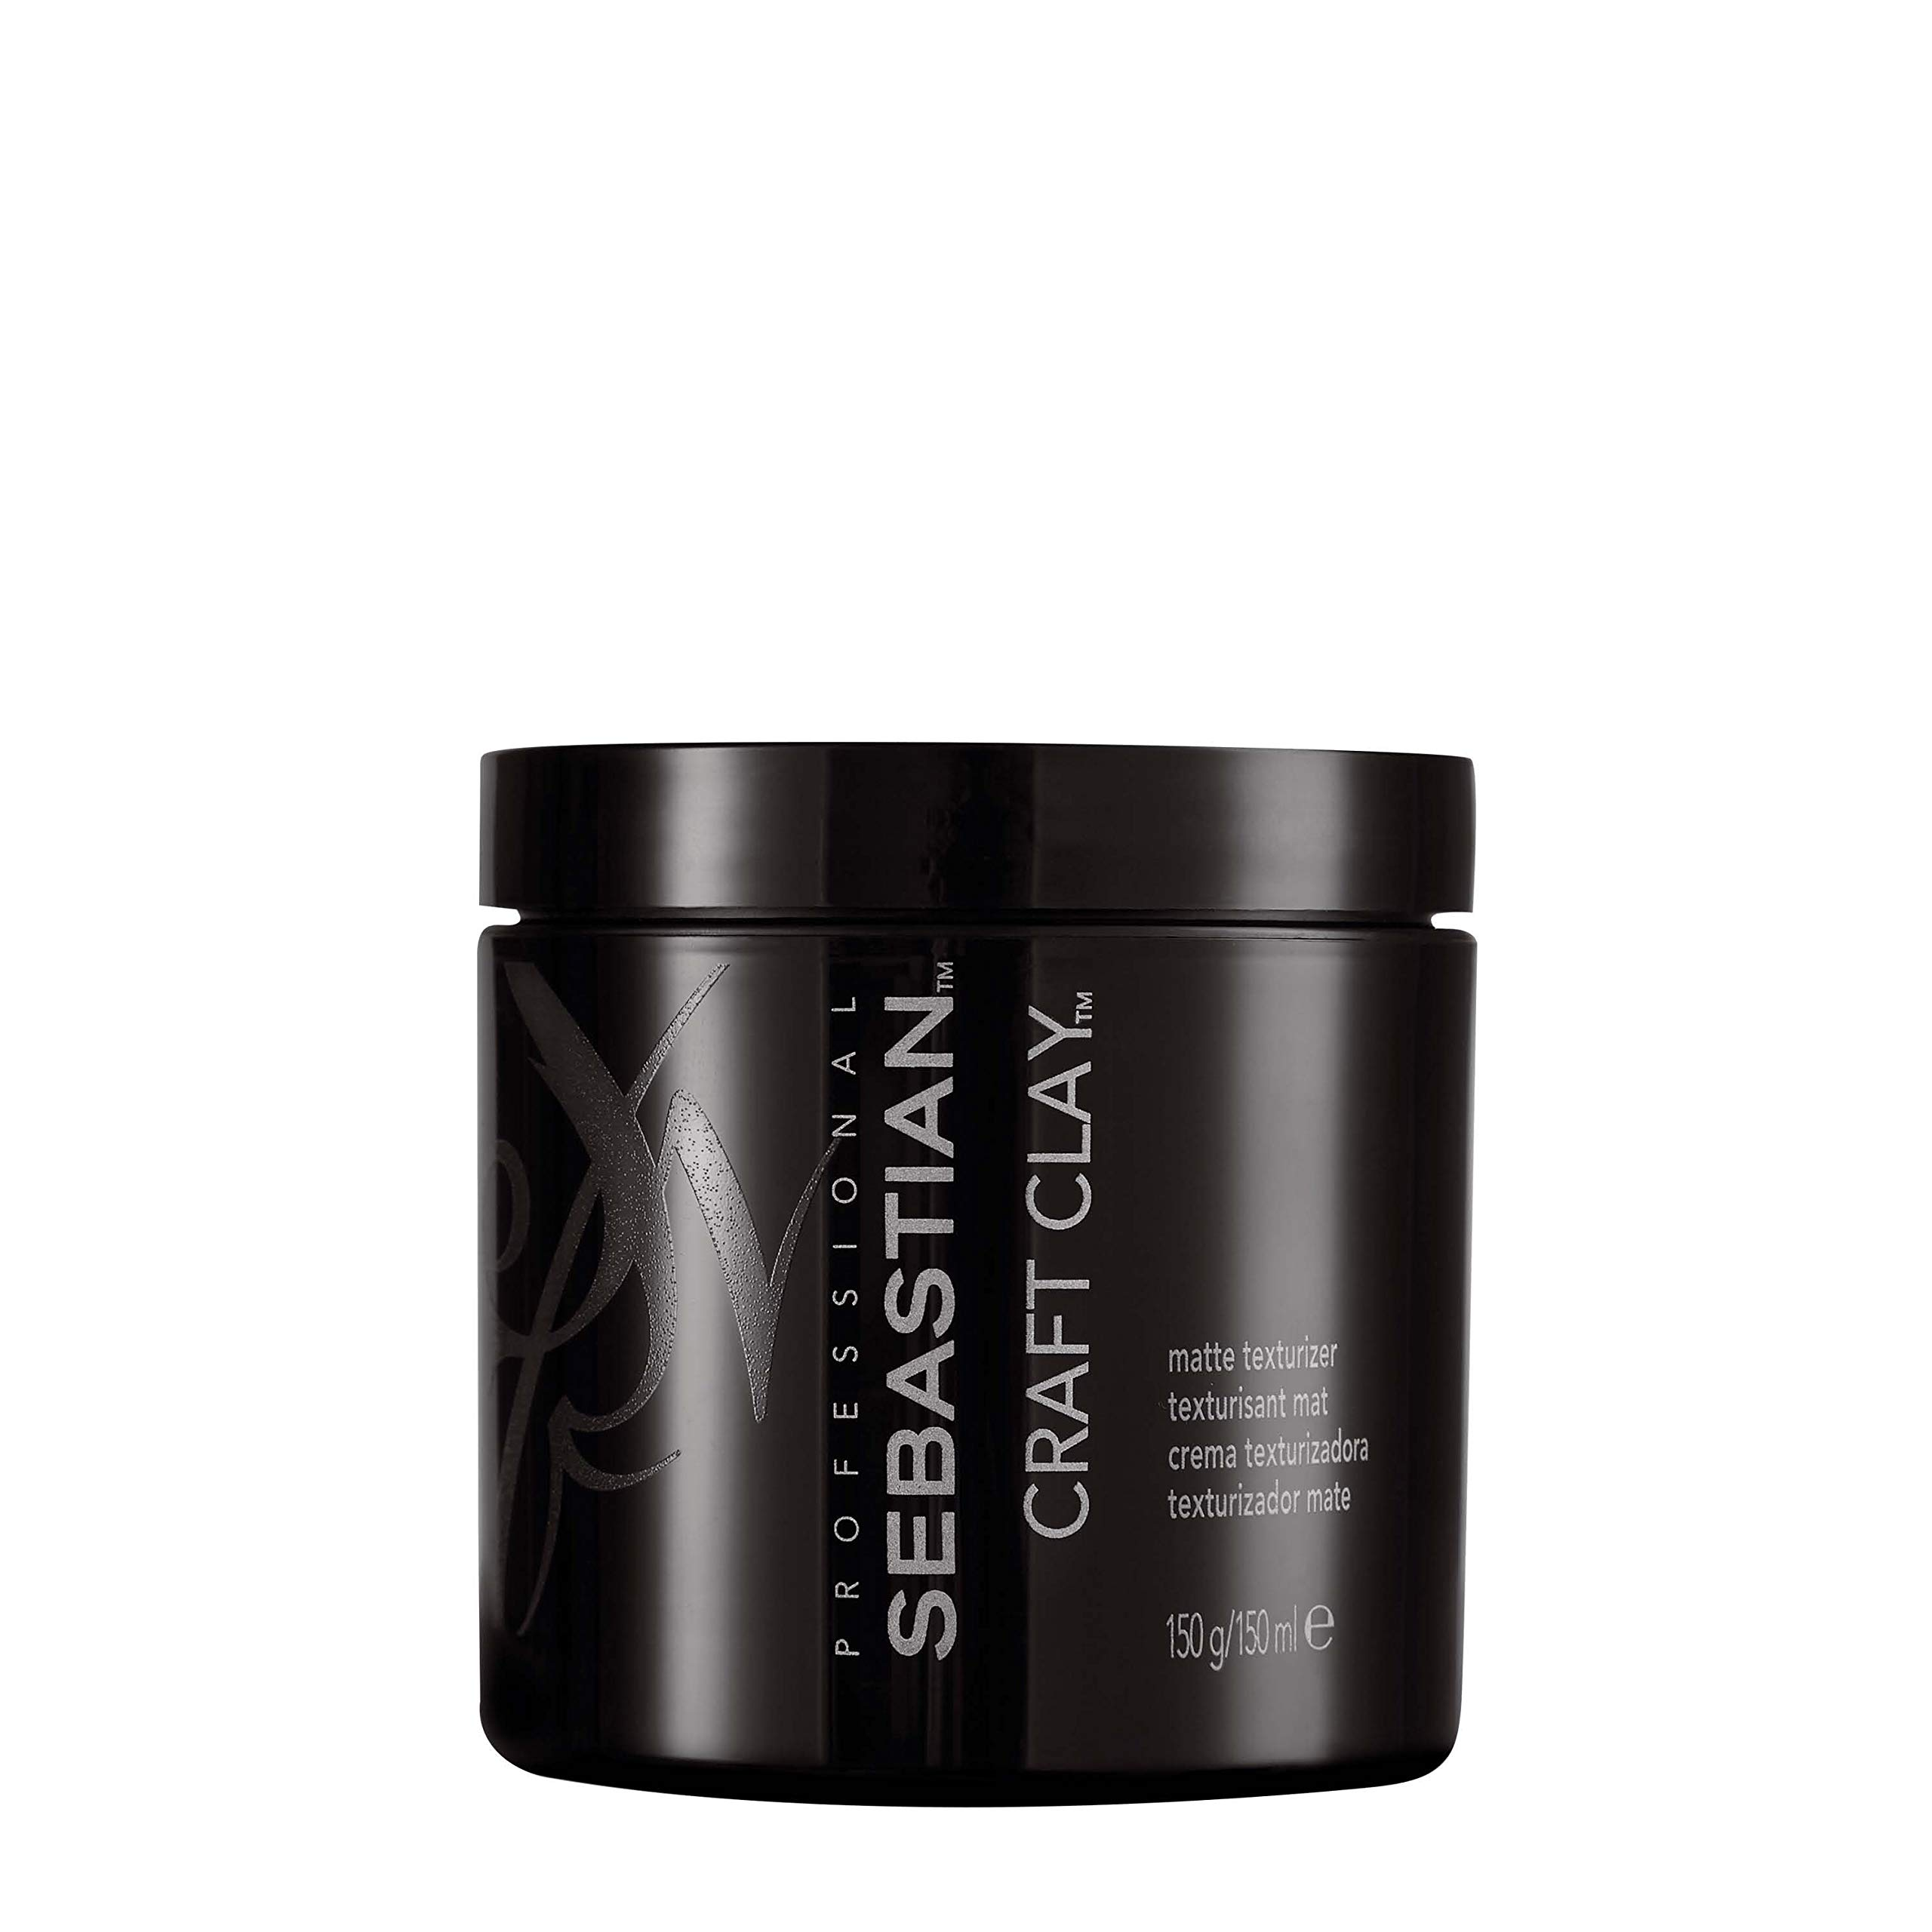 Sebastian Craft Clay Matte Texturizer, Remoldable Texturizing Hair Clay, 1.7 oz